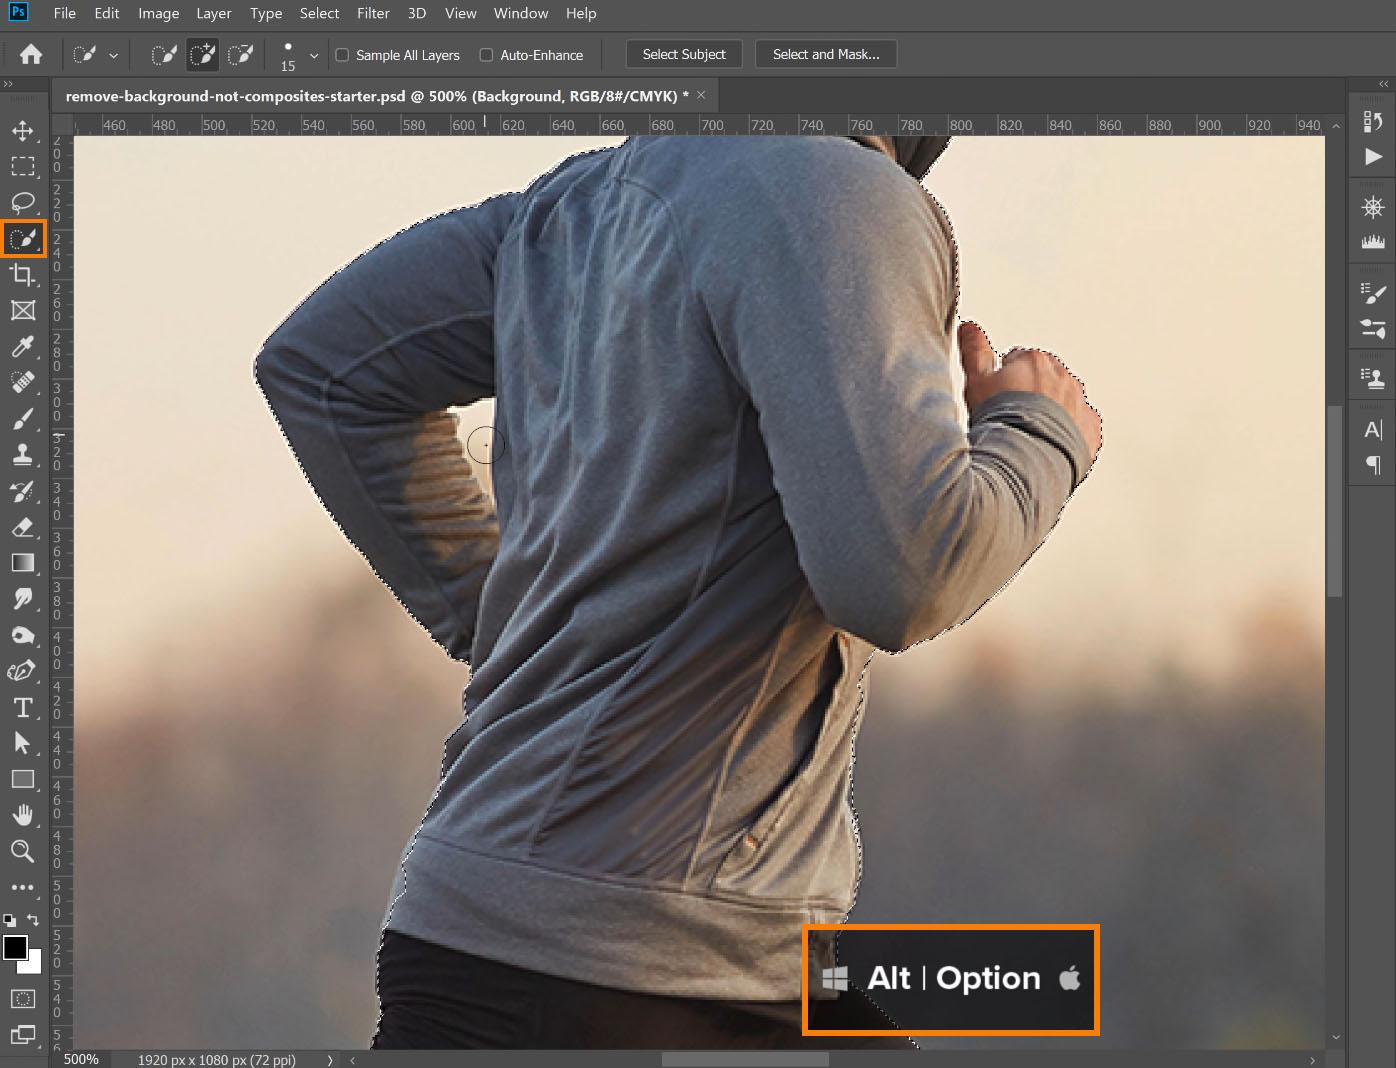 hold Alt (Windows) or Option (macOS)